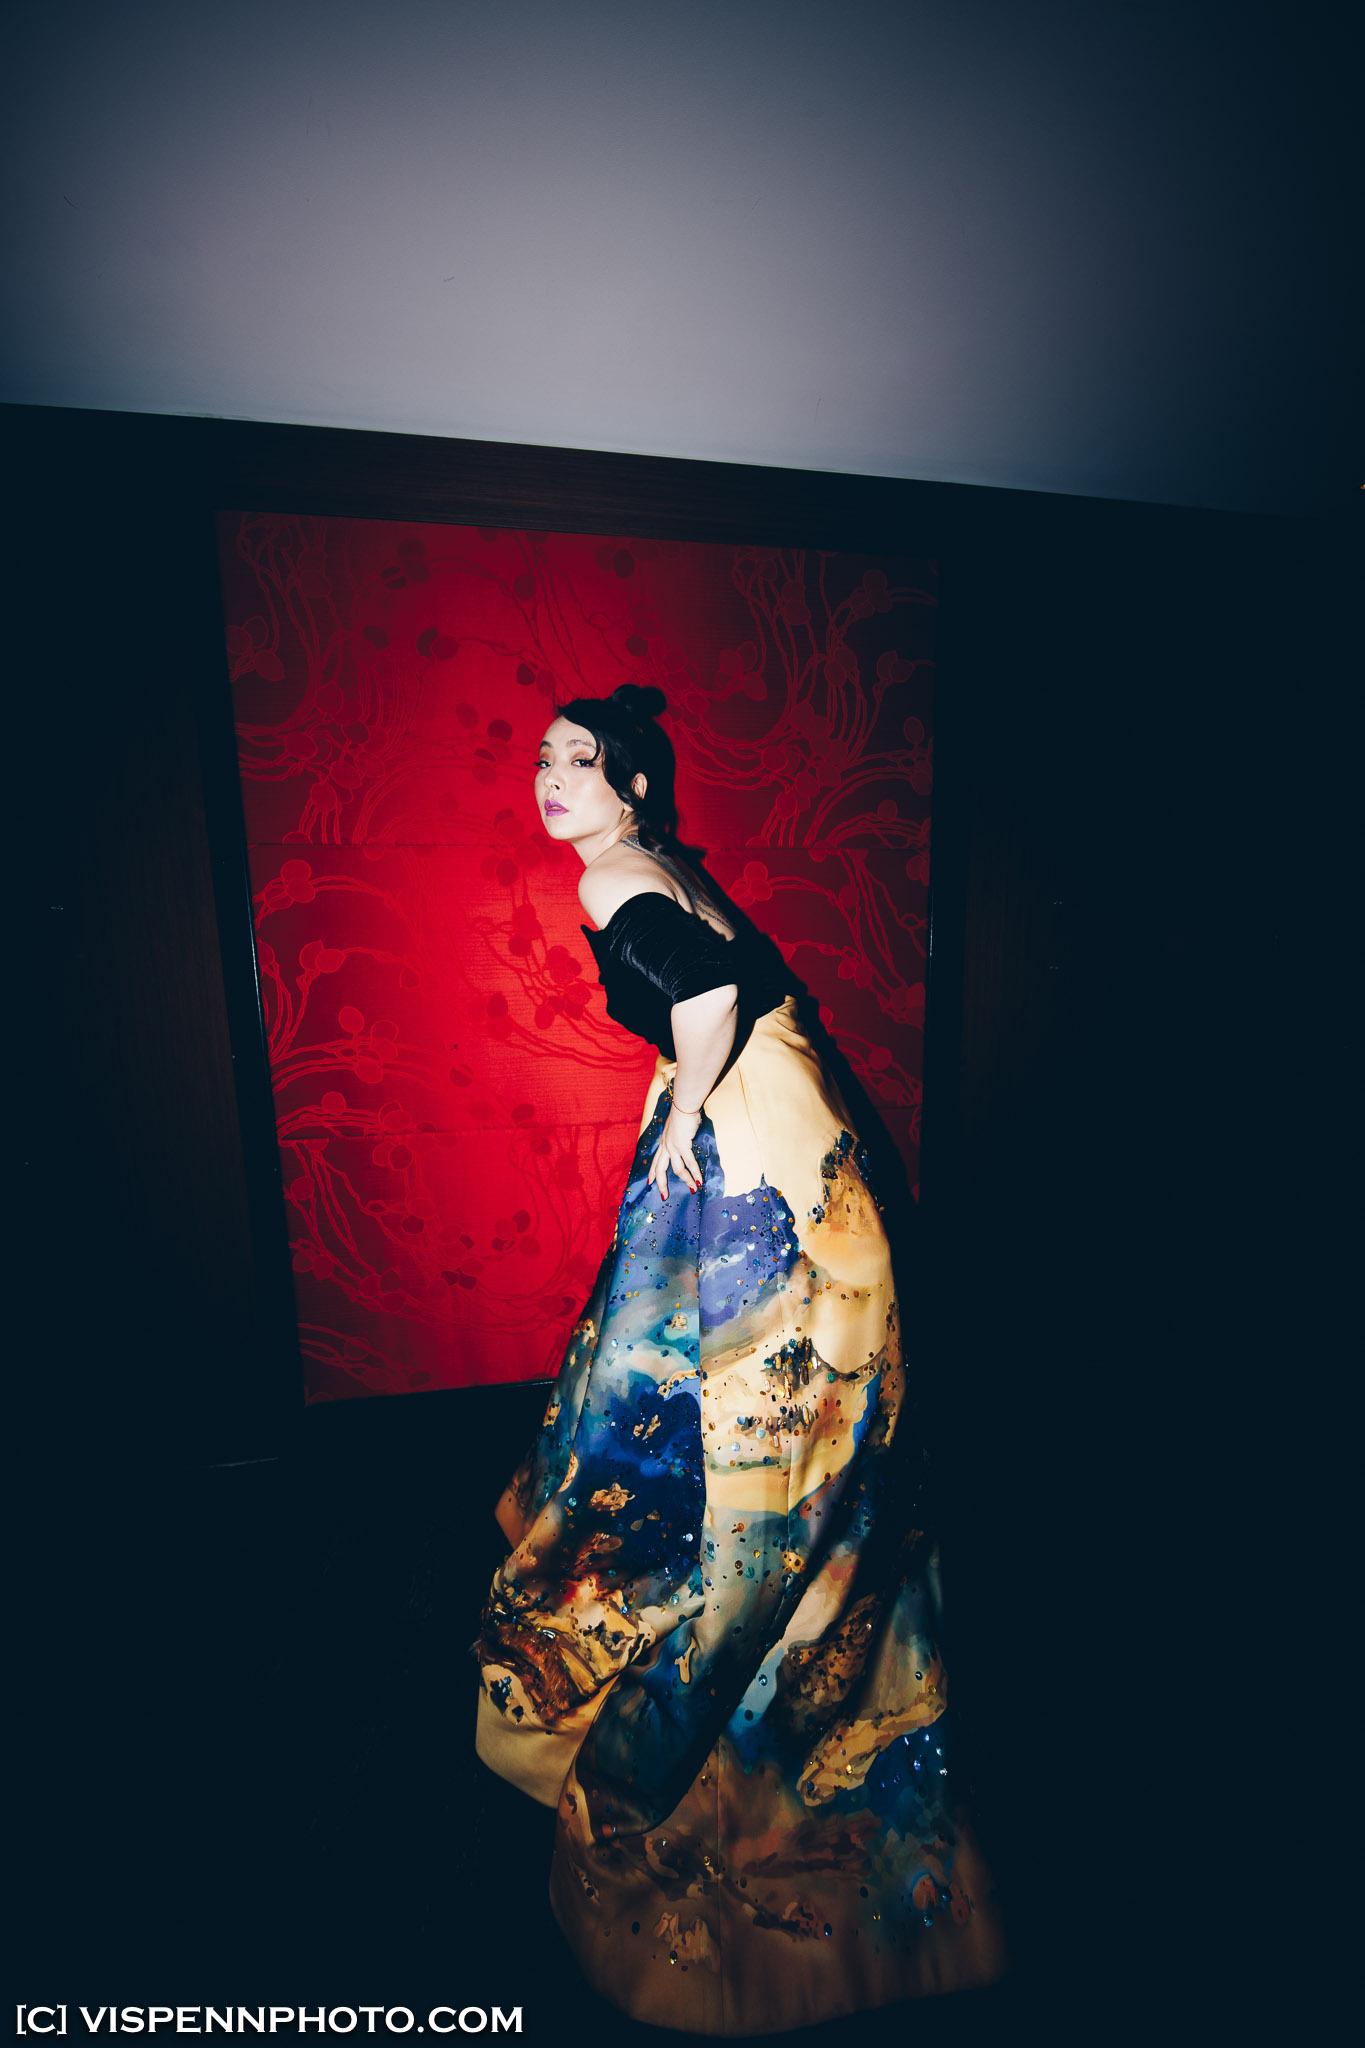 Melbourne Fashion Portrait Commercial Photography VISPENN 墨尔本 服装 商业 人像 摄影 AACTA D3 0494 2P 5D4 VISPENN